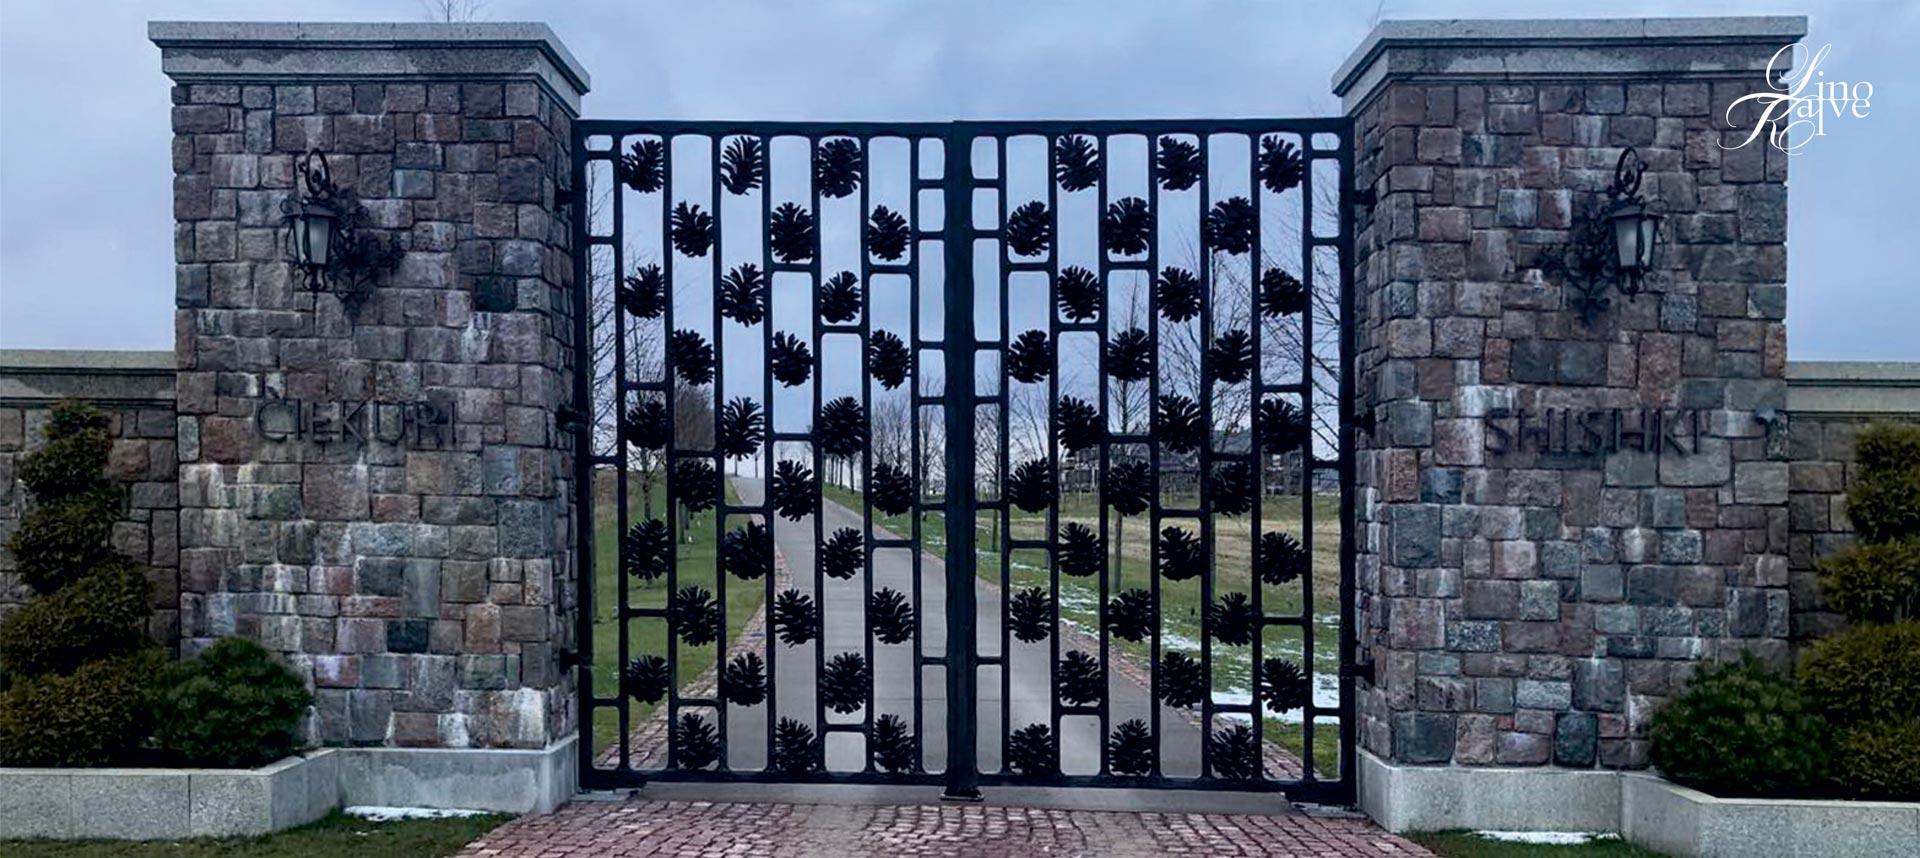 HUNTING LODGE. GATES, AND LIGHTS